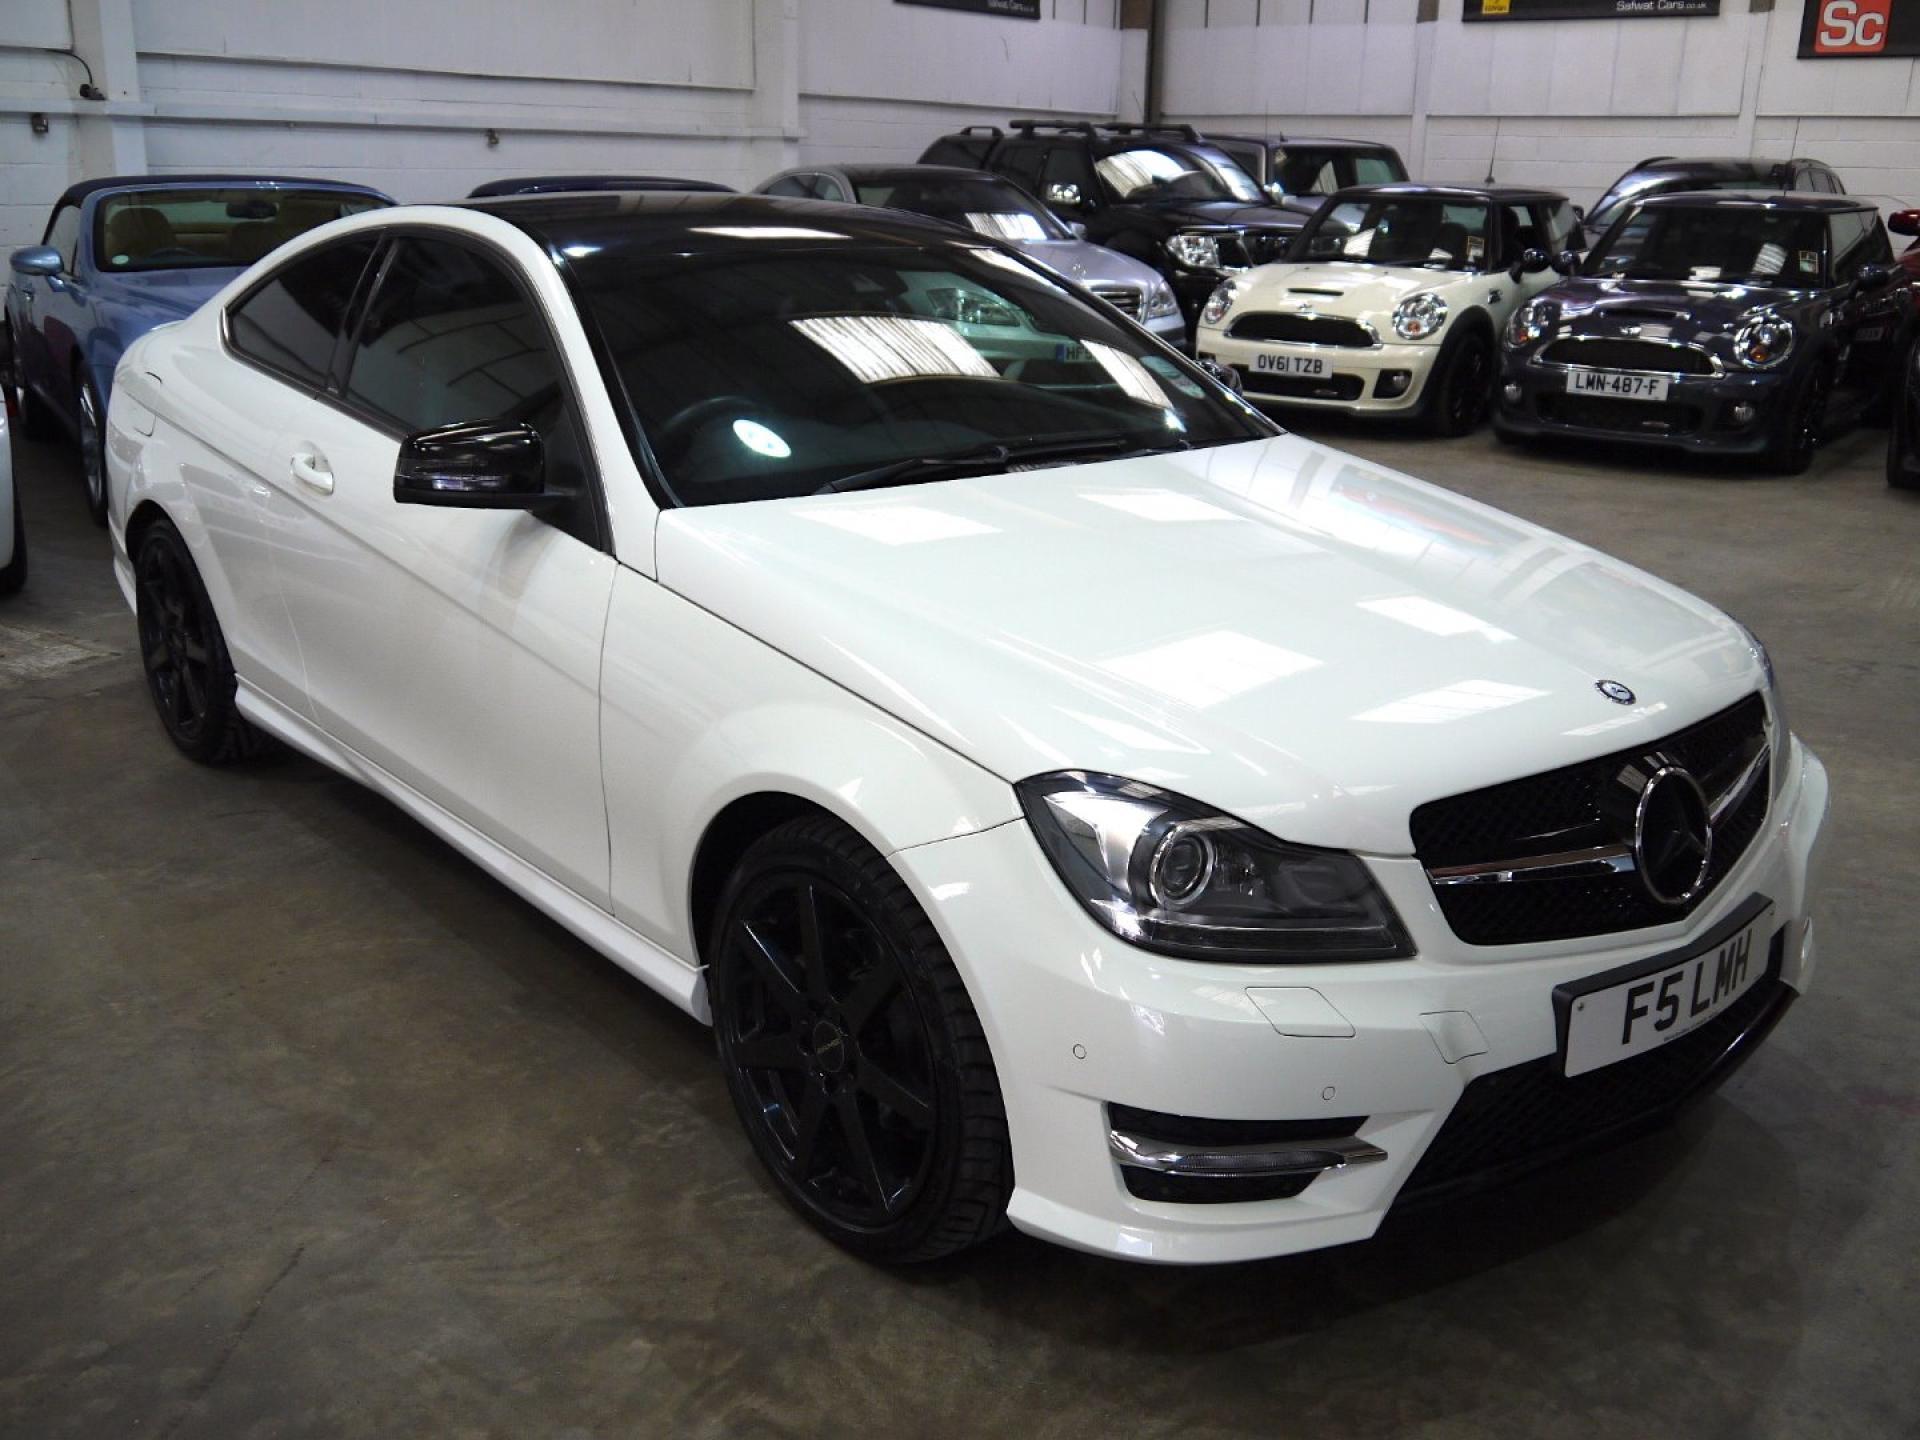 Safwat cars prestige cars southend on sea - Mercedes c250 sport coupe ...